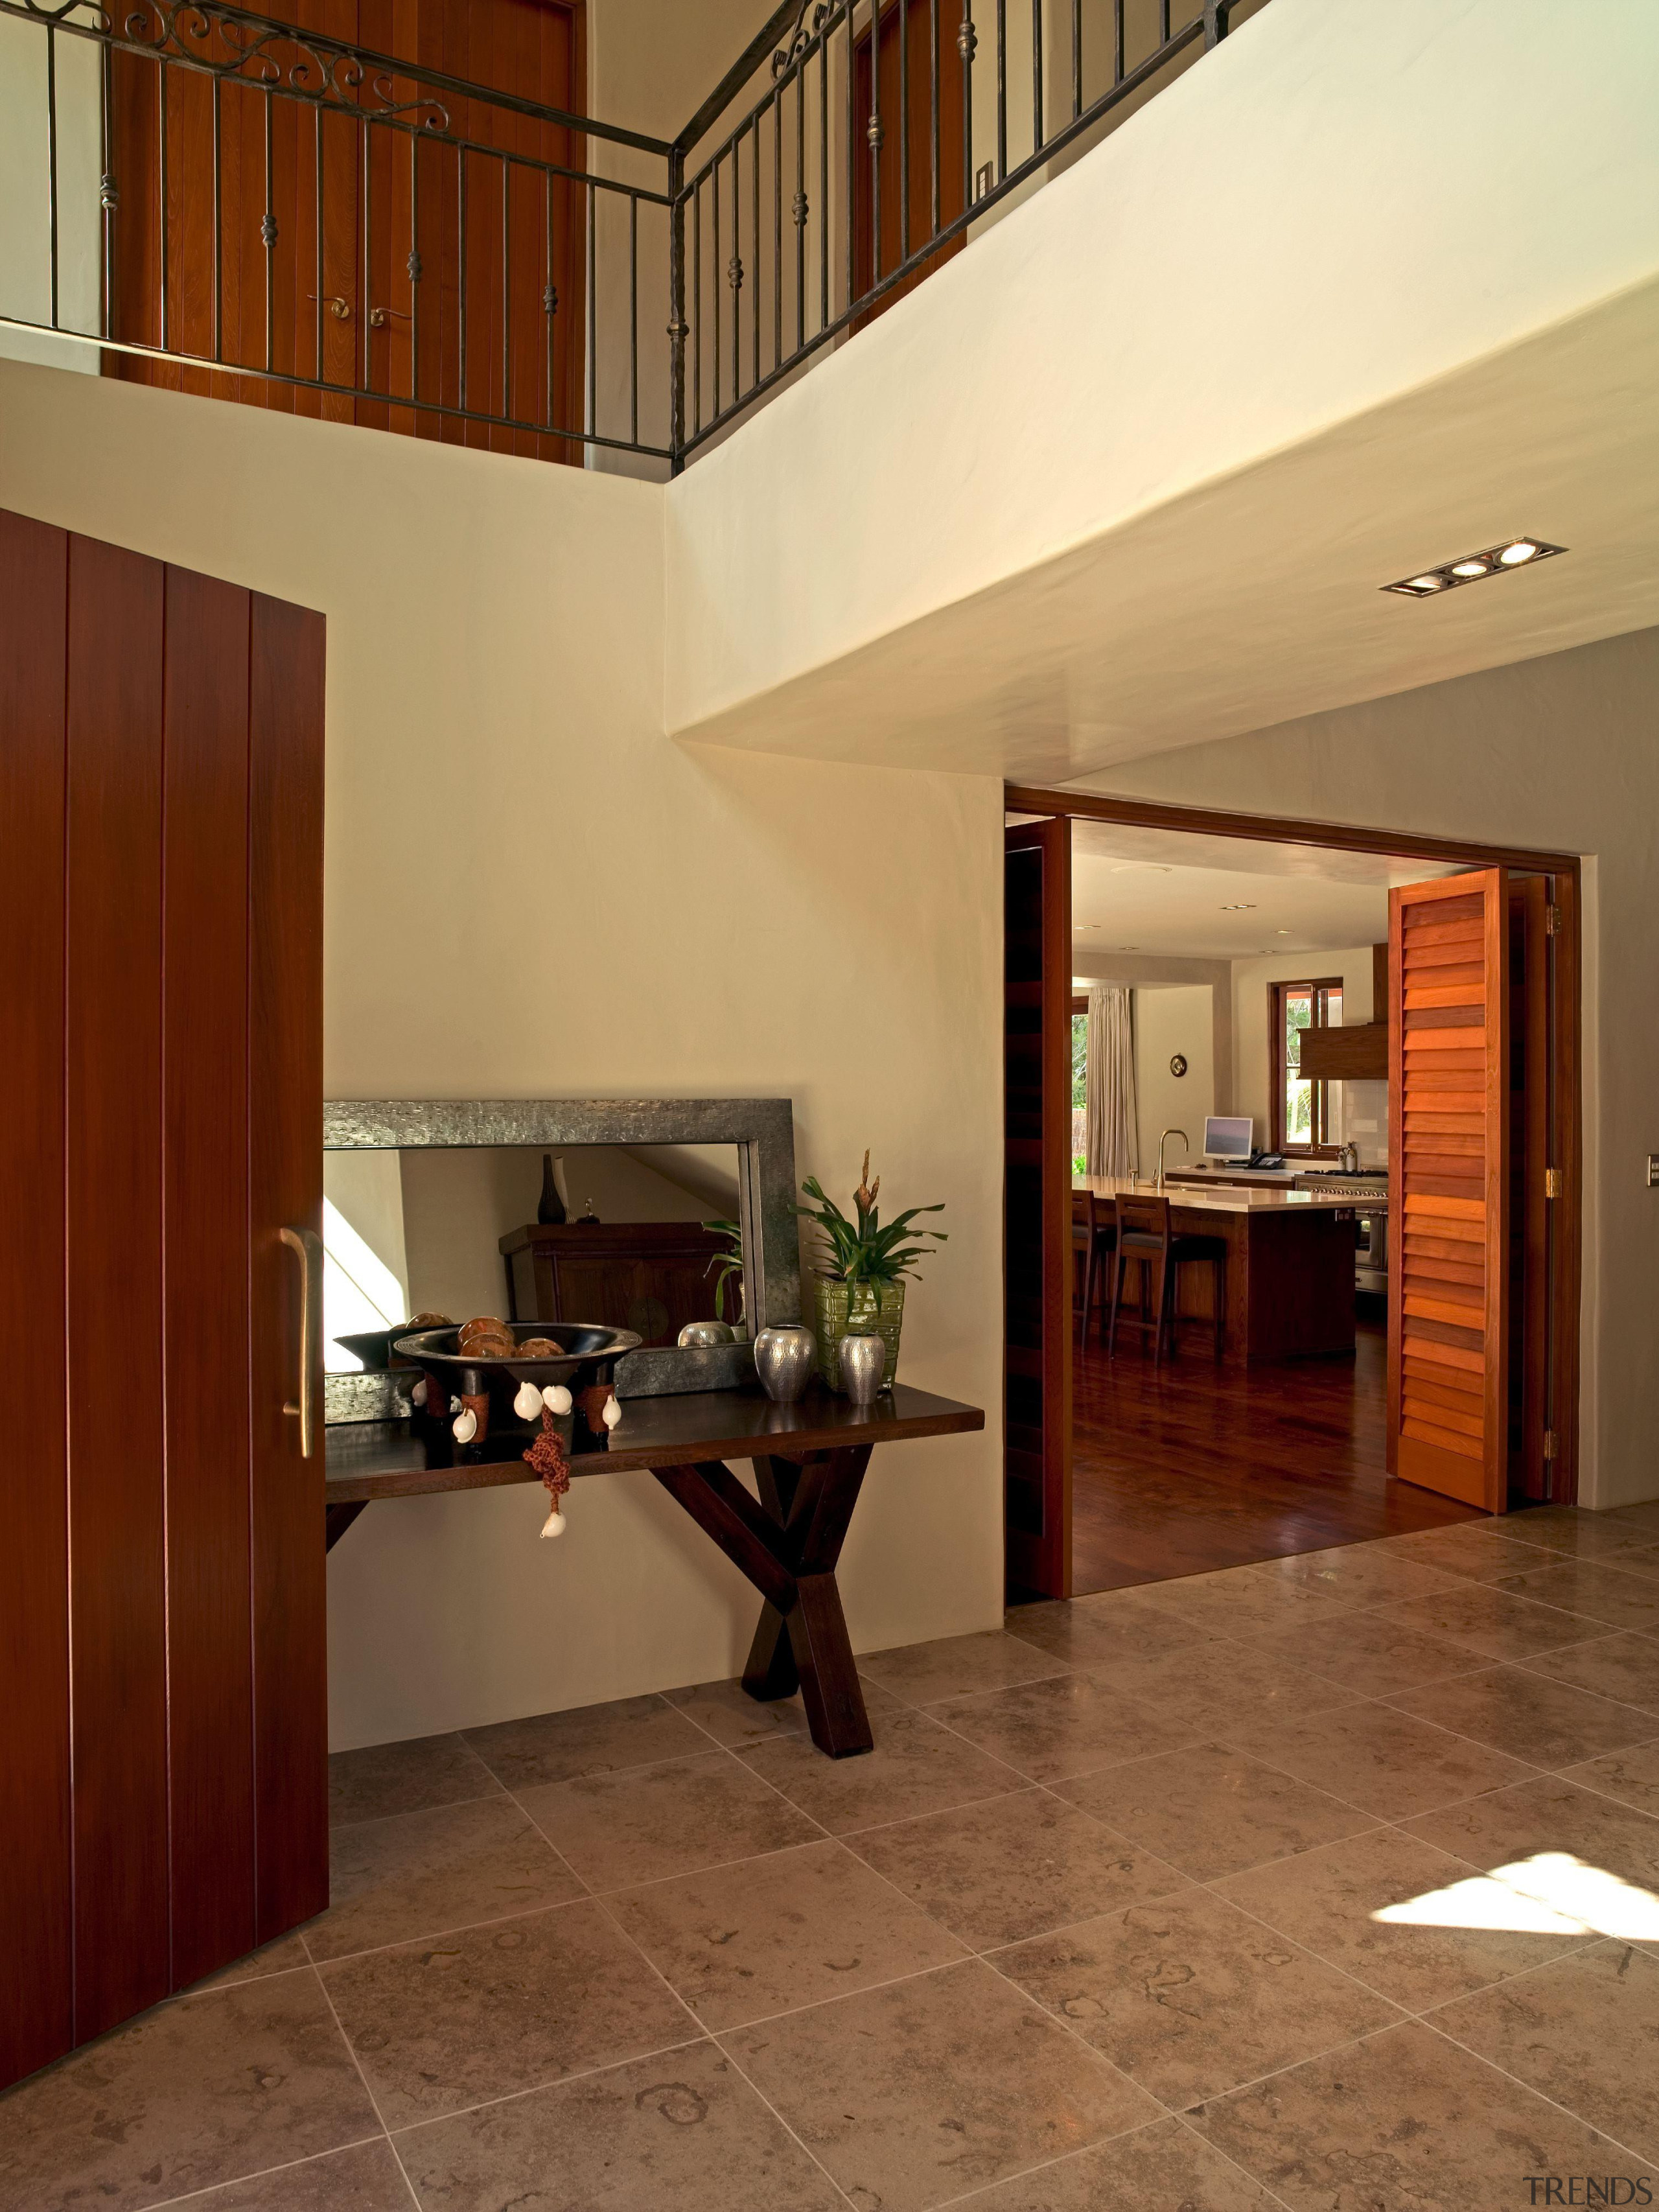 139 onetaunga front door - Onetaunga Front Door architecture, ceiling, estate, floor, flooring, hardwood, interior design, laminate flooring, living room, lobby, real estate, tile, wall, wood, wood flooring, brown